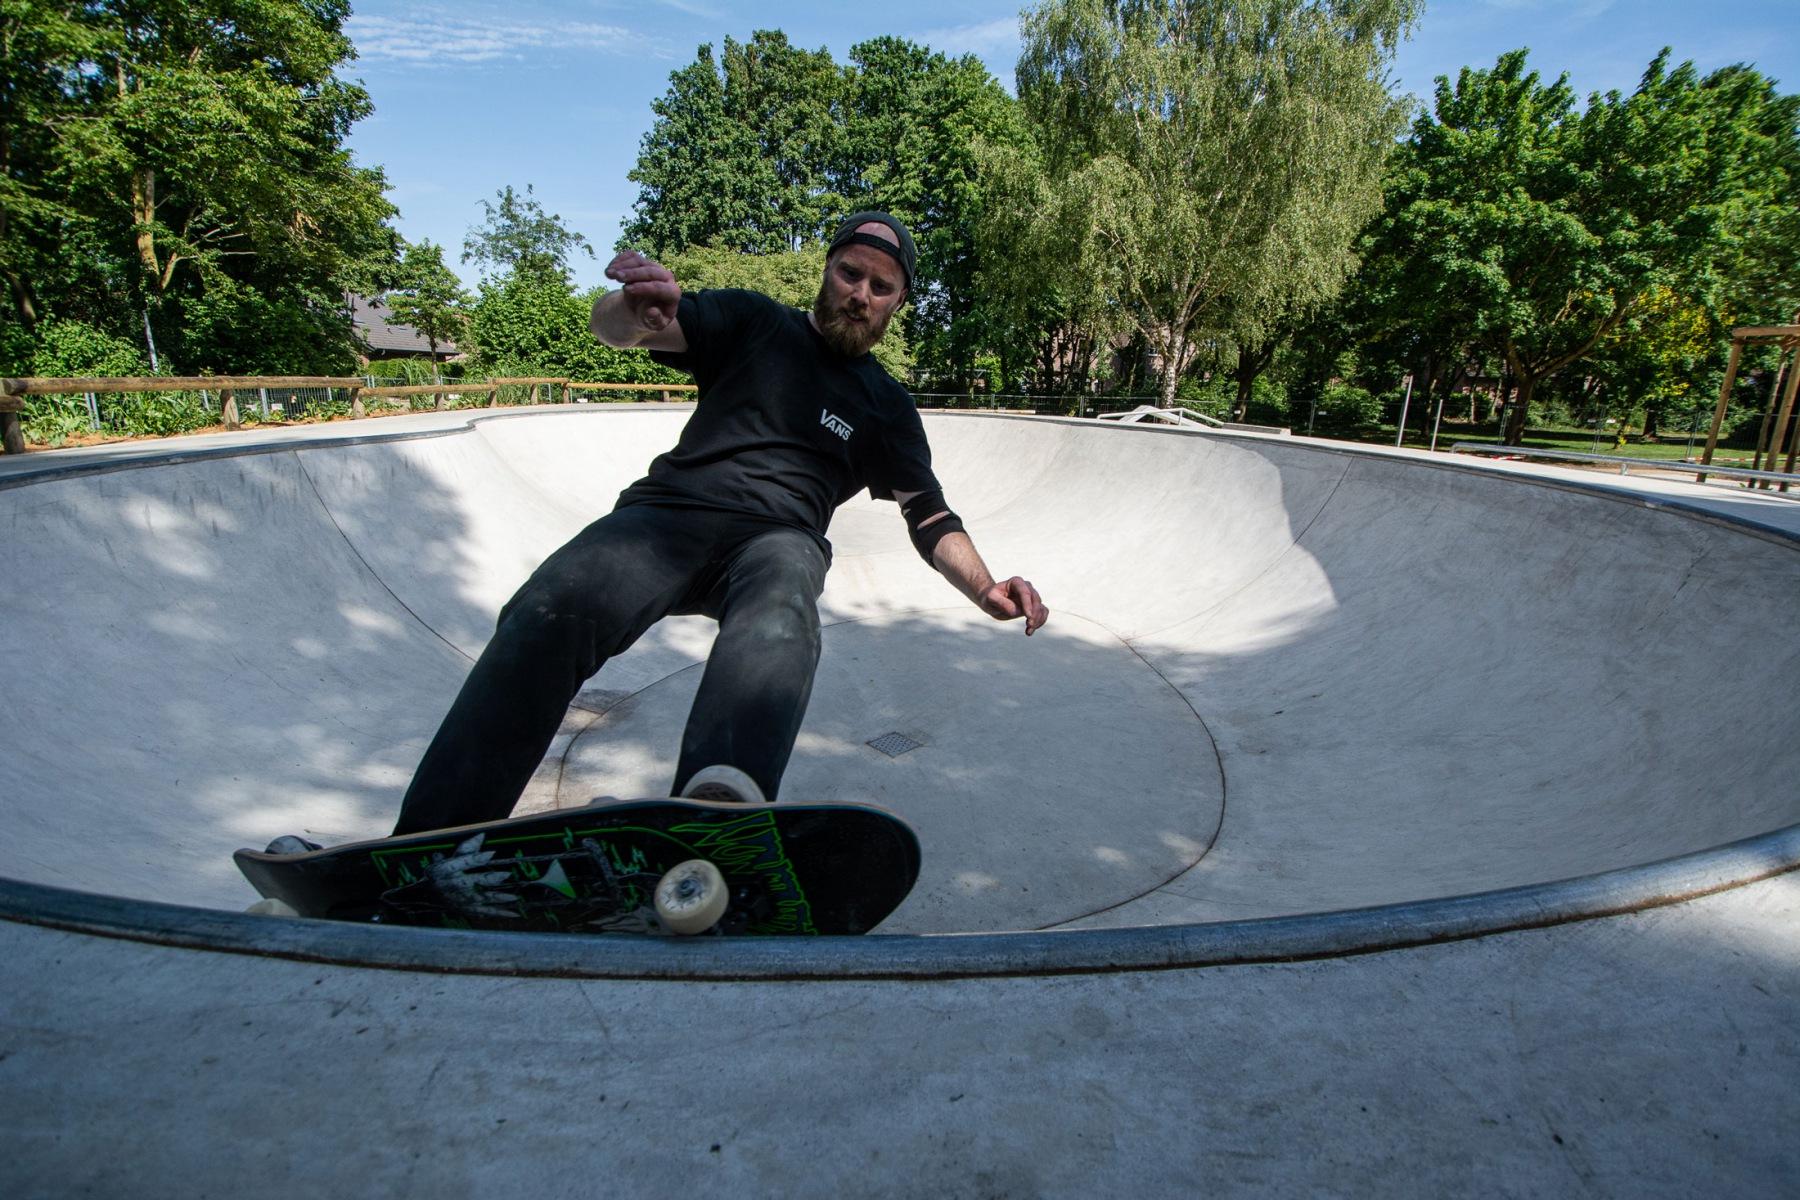 Skatepark_Sonsbeck_05.20_05